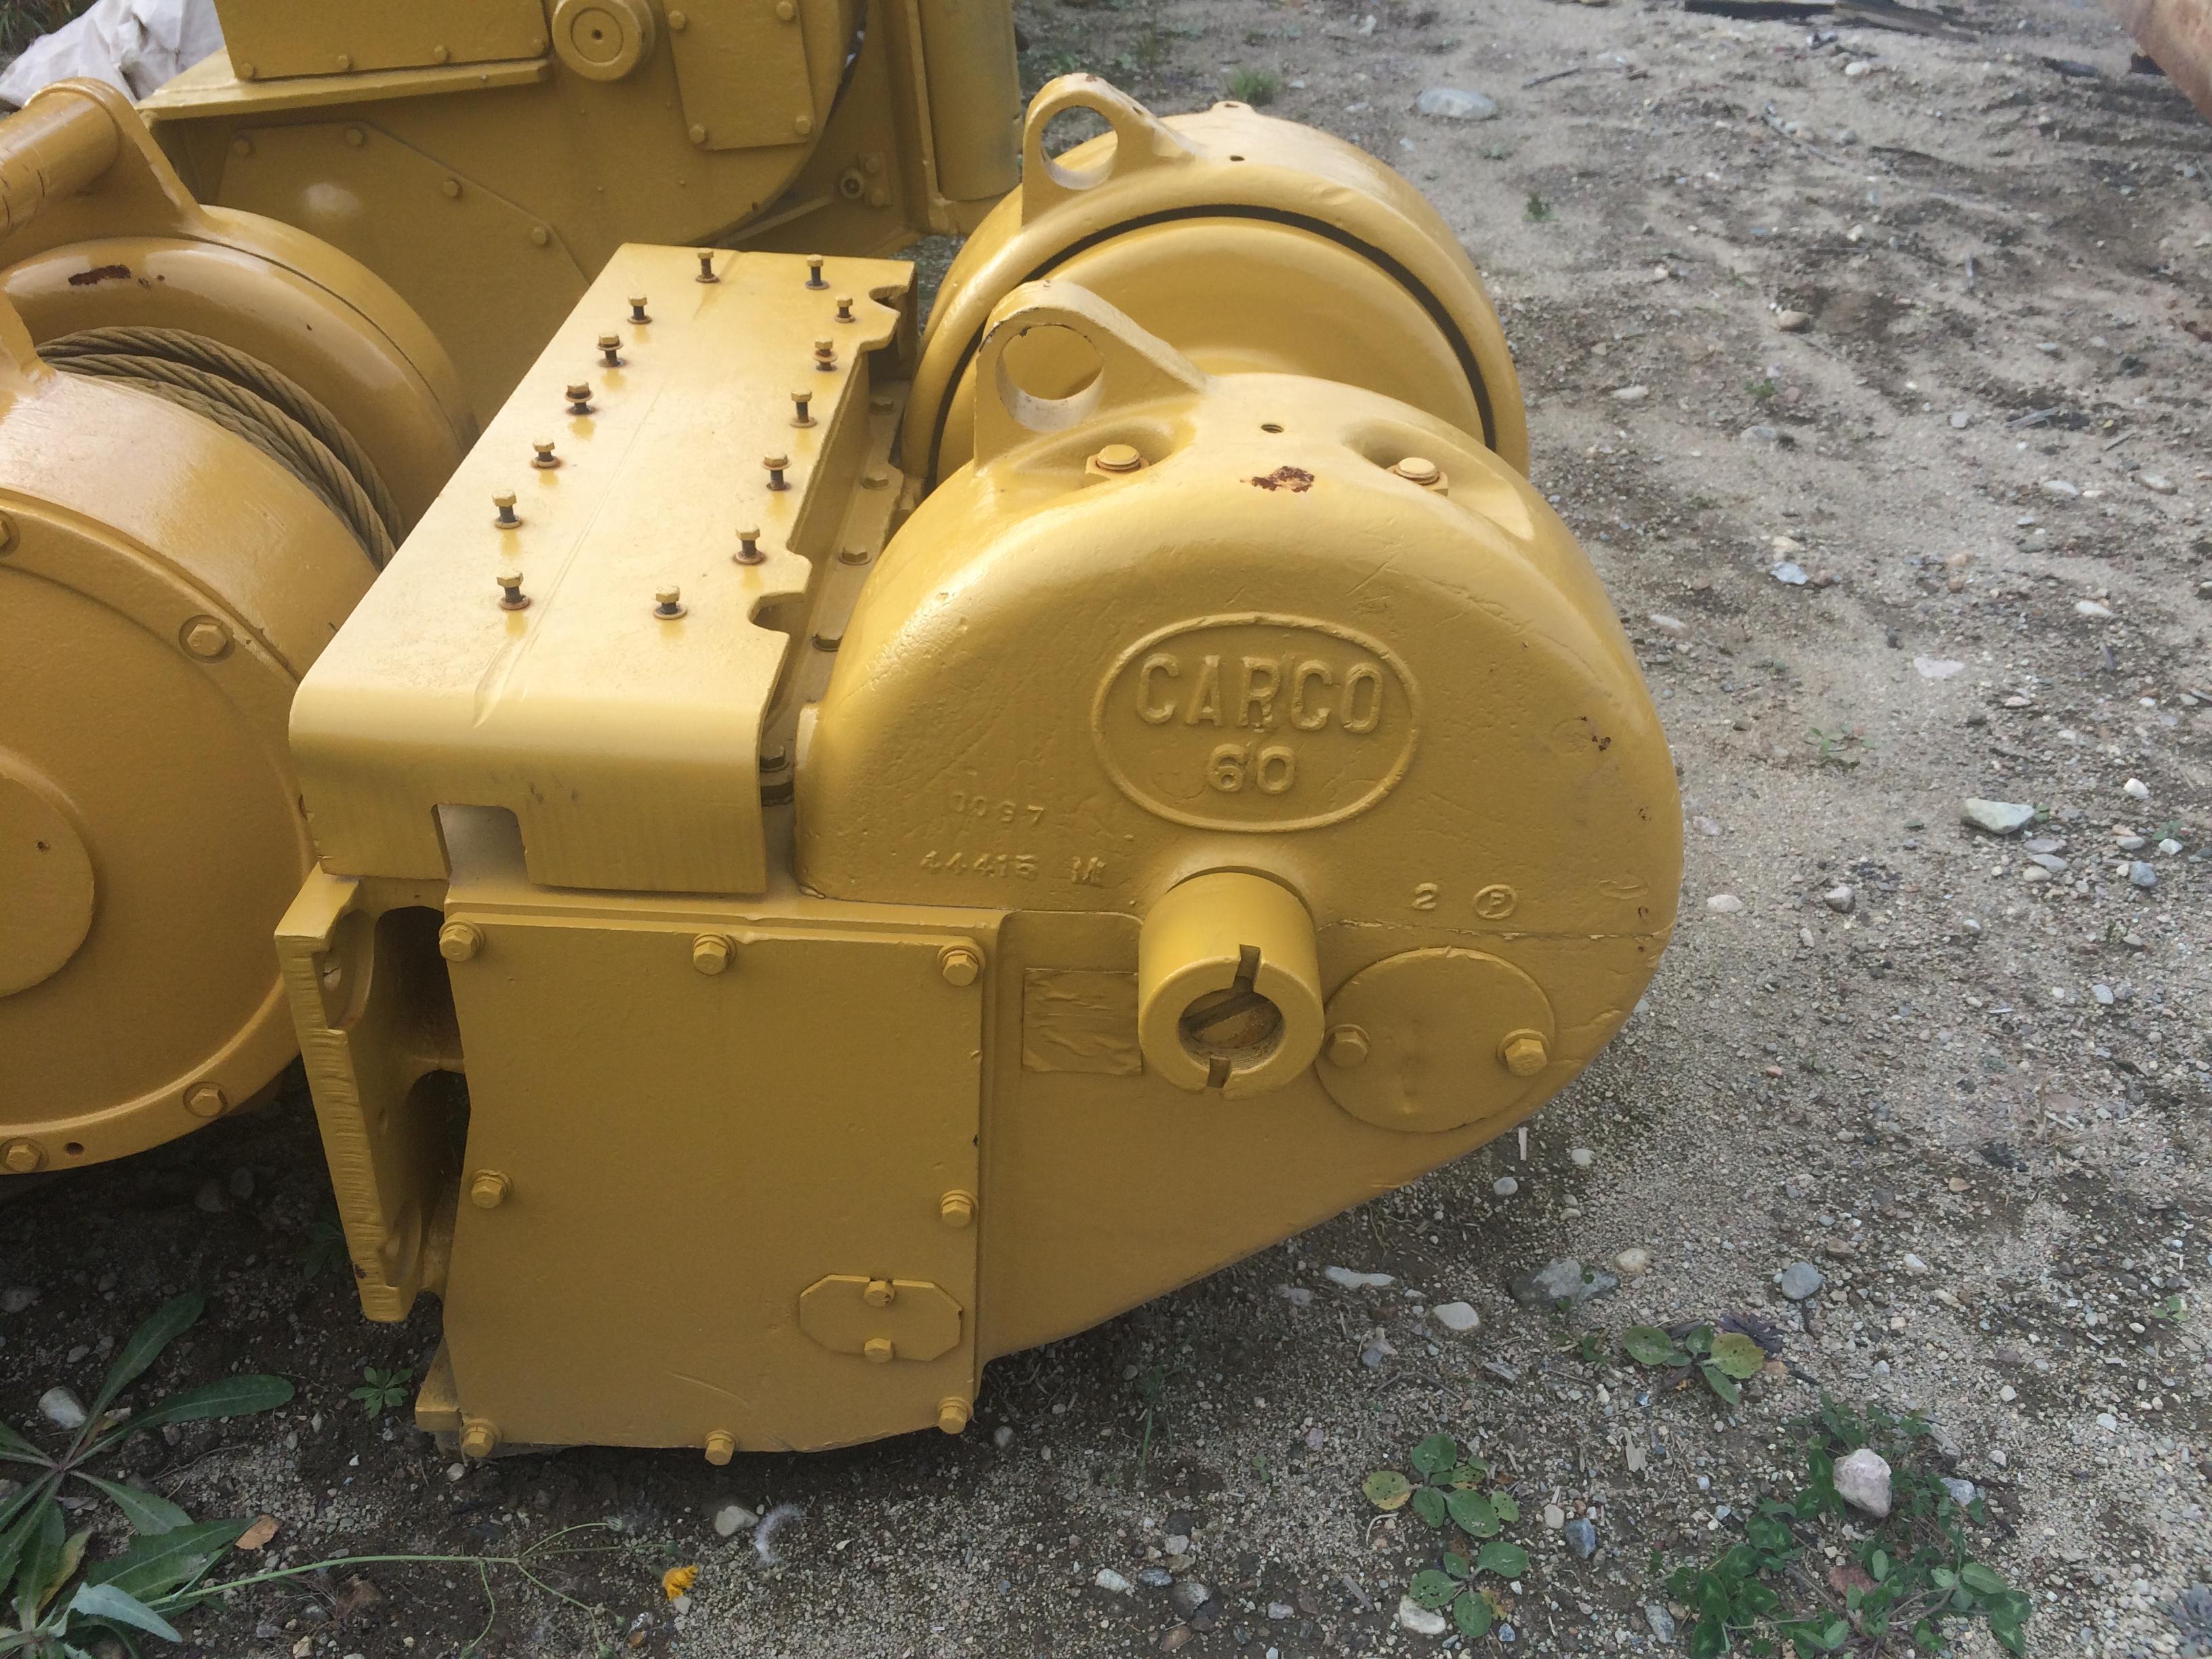 Carco 60 winch